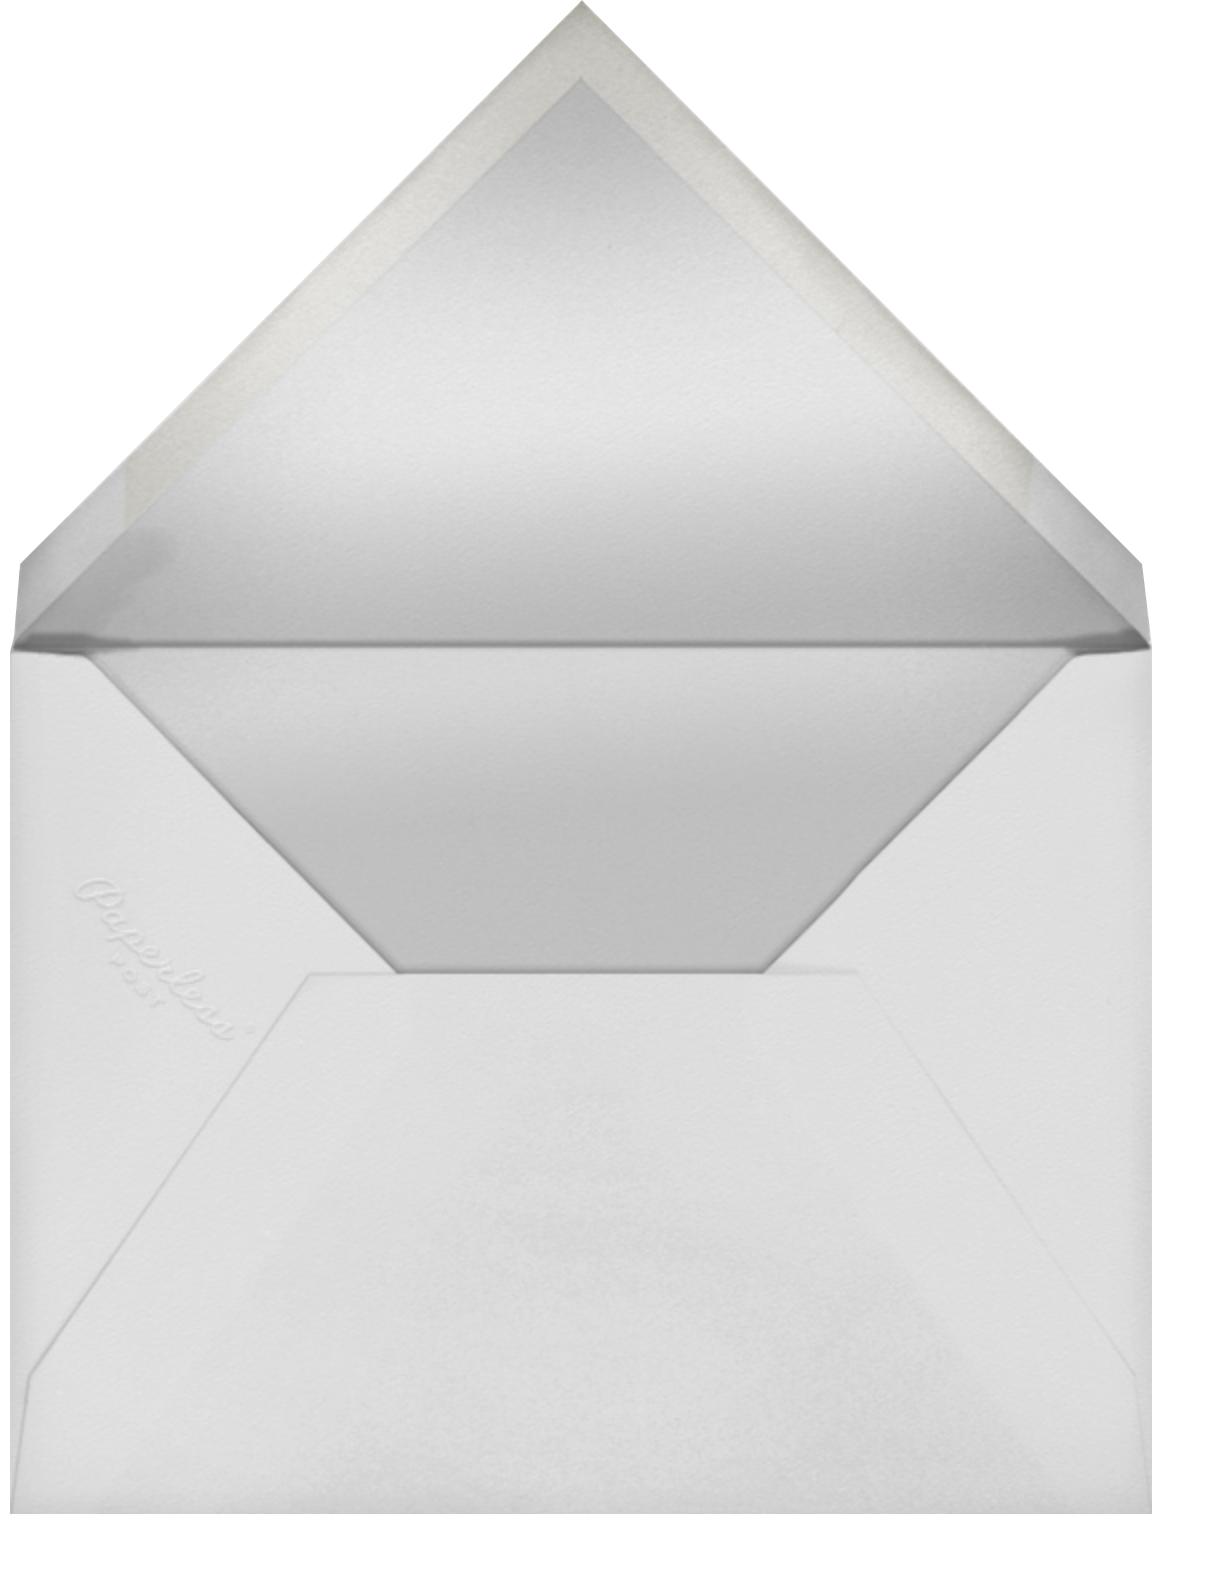 Chalkboard - Happy Anniversary - Paperless Post - Anniversary - envelope back